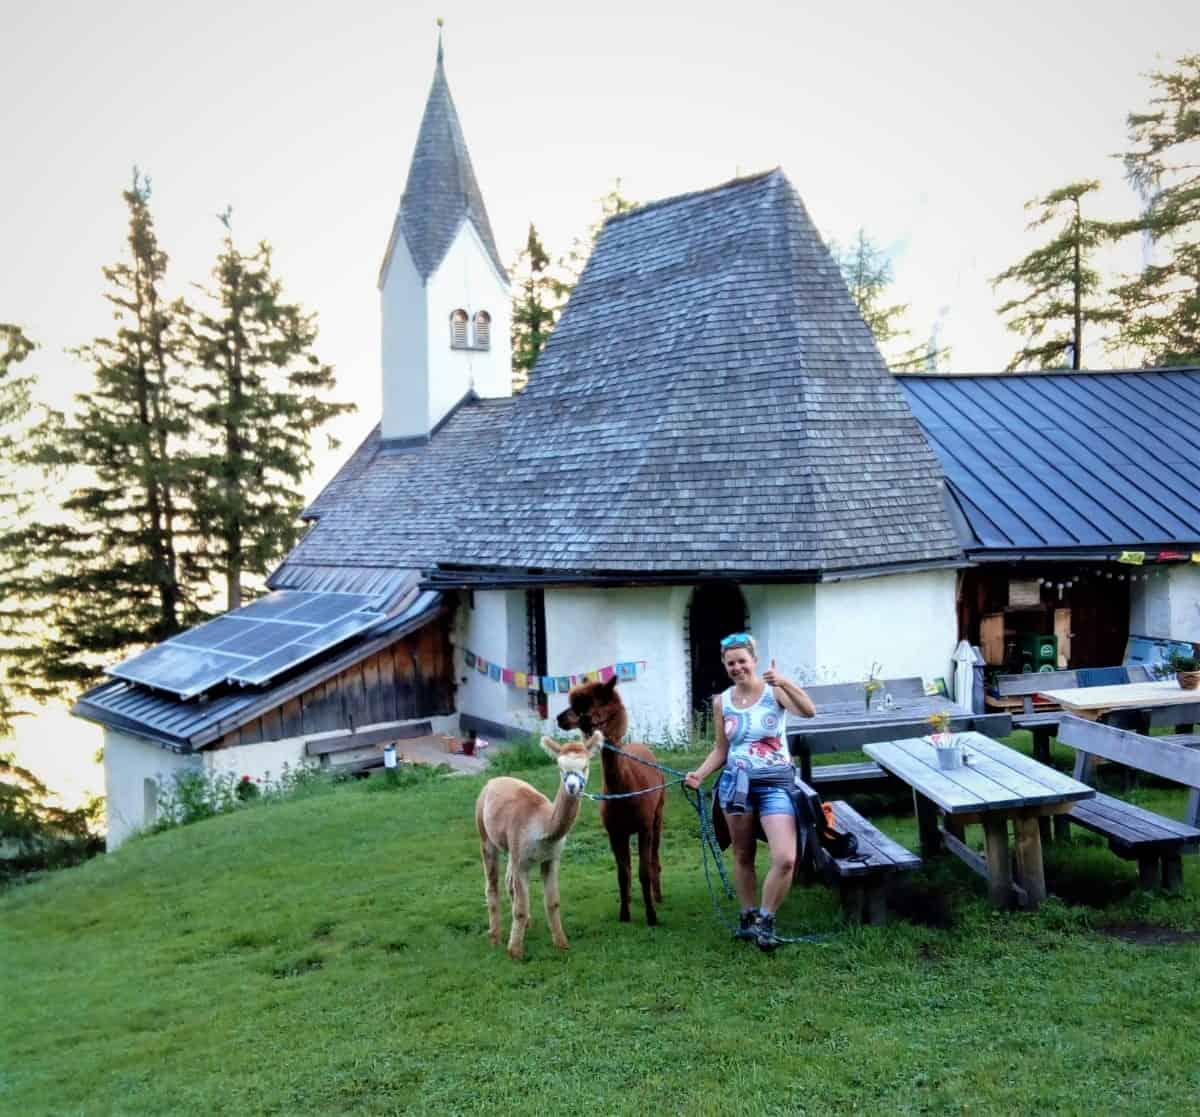 Gschnitzer-Alpaka-Sankt-Magdalena-Gschnitz Wanderungen